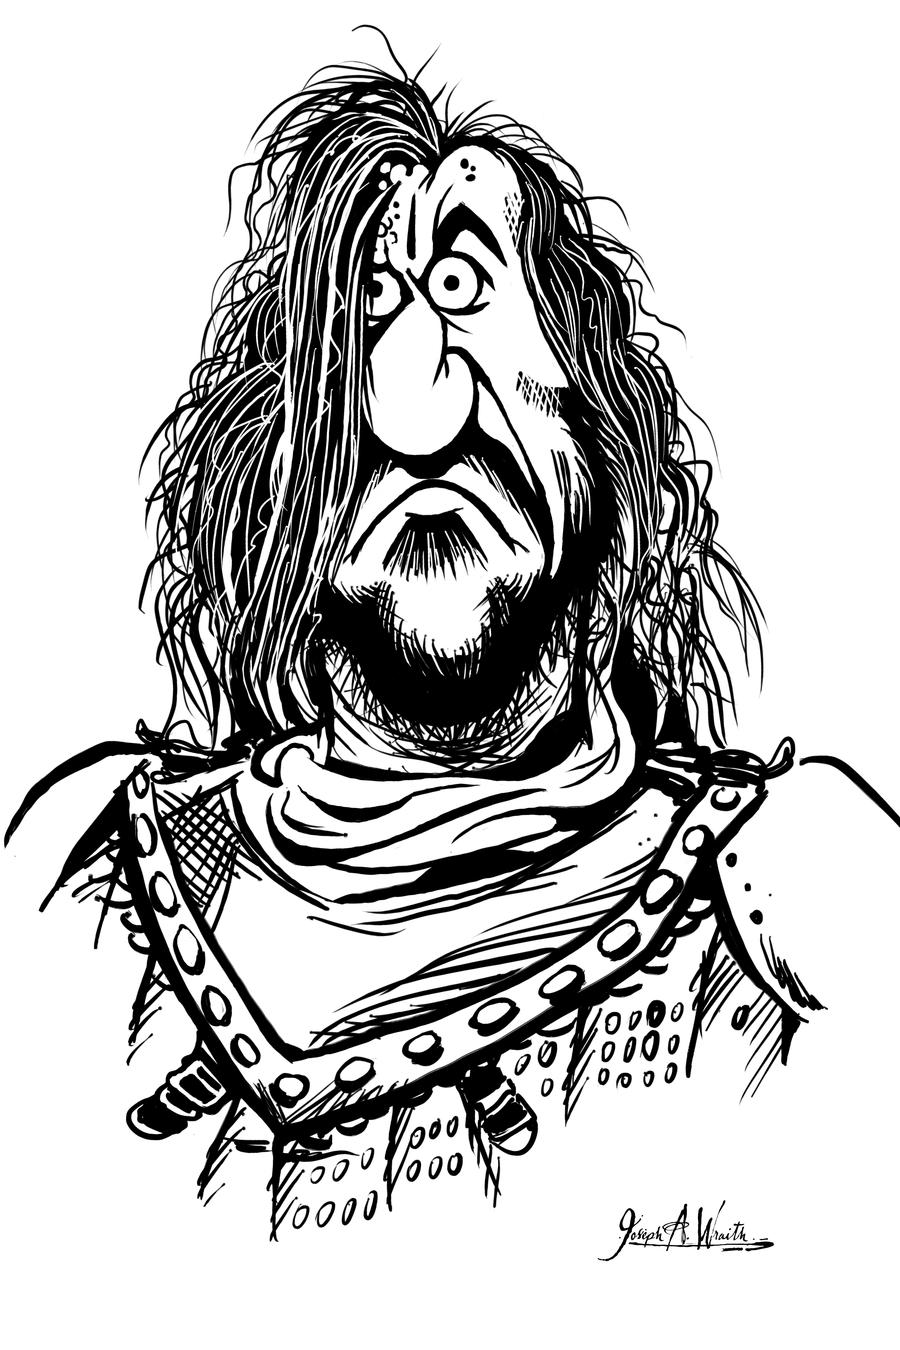 The Hound by JWraith